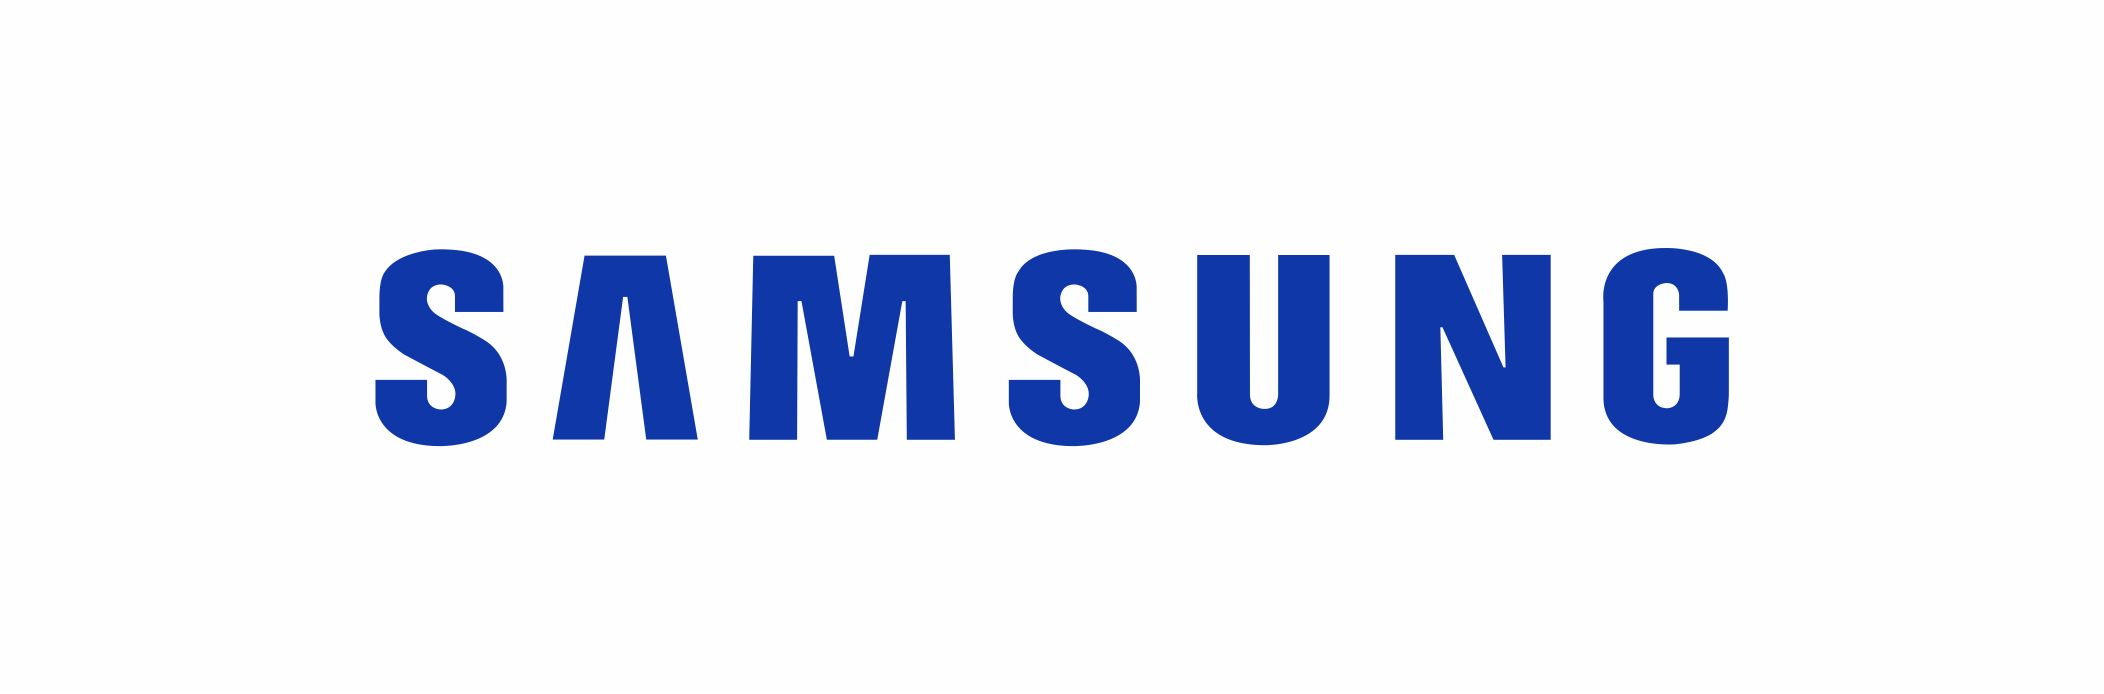 #8 Samsung